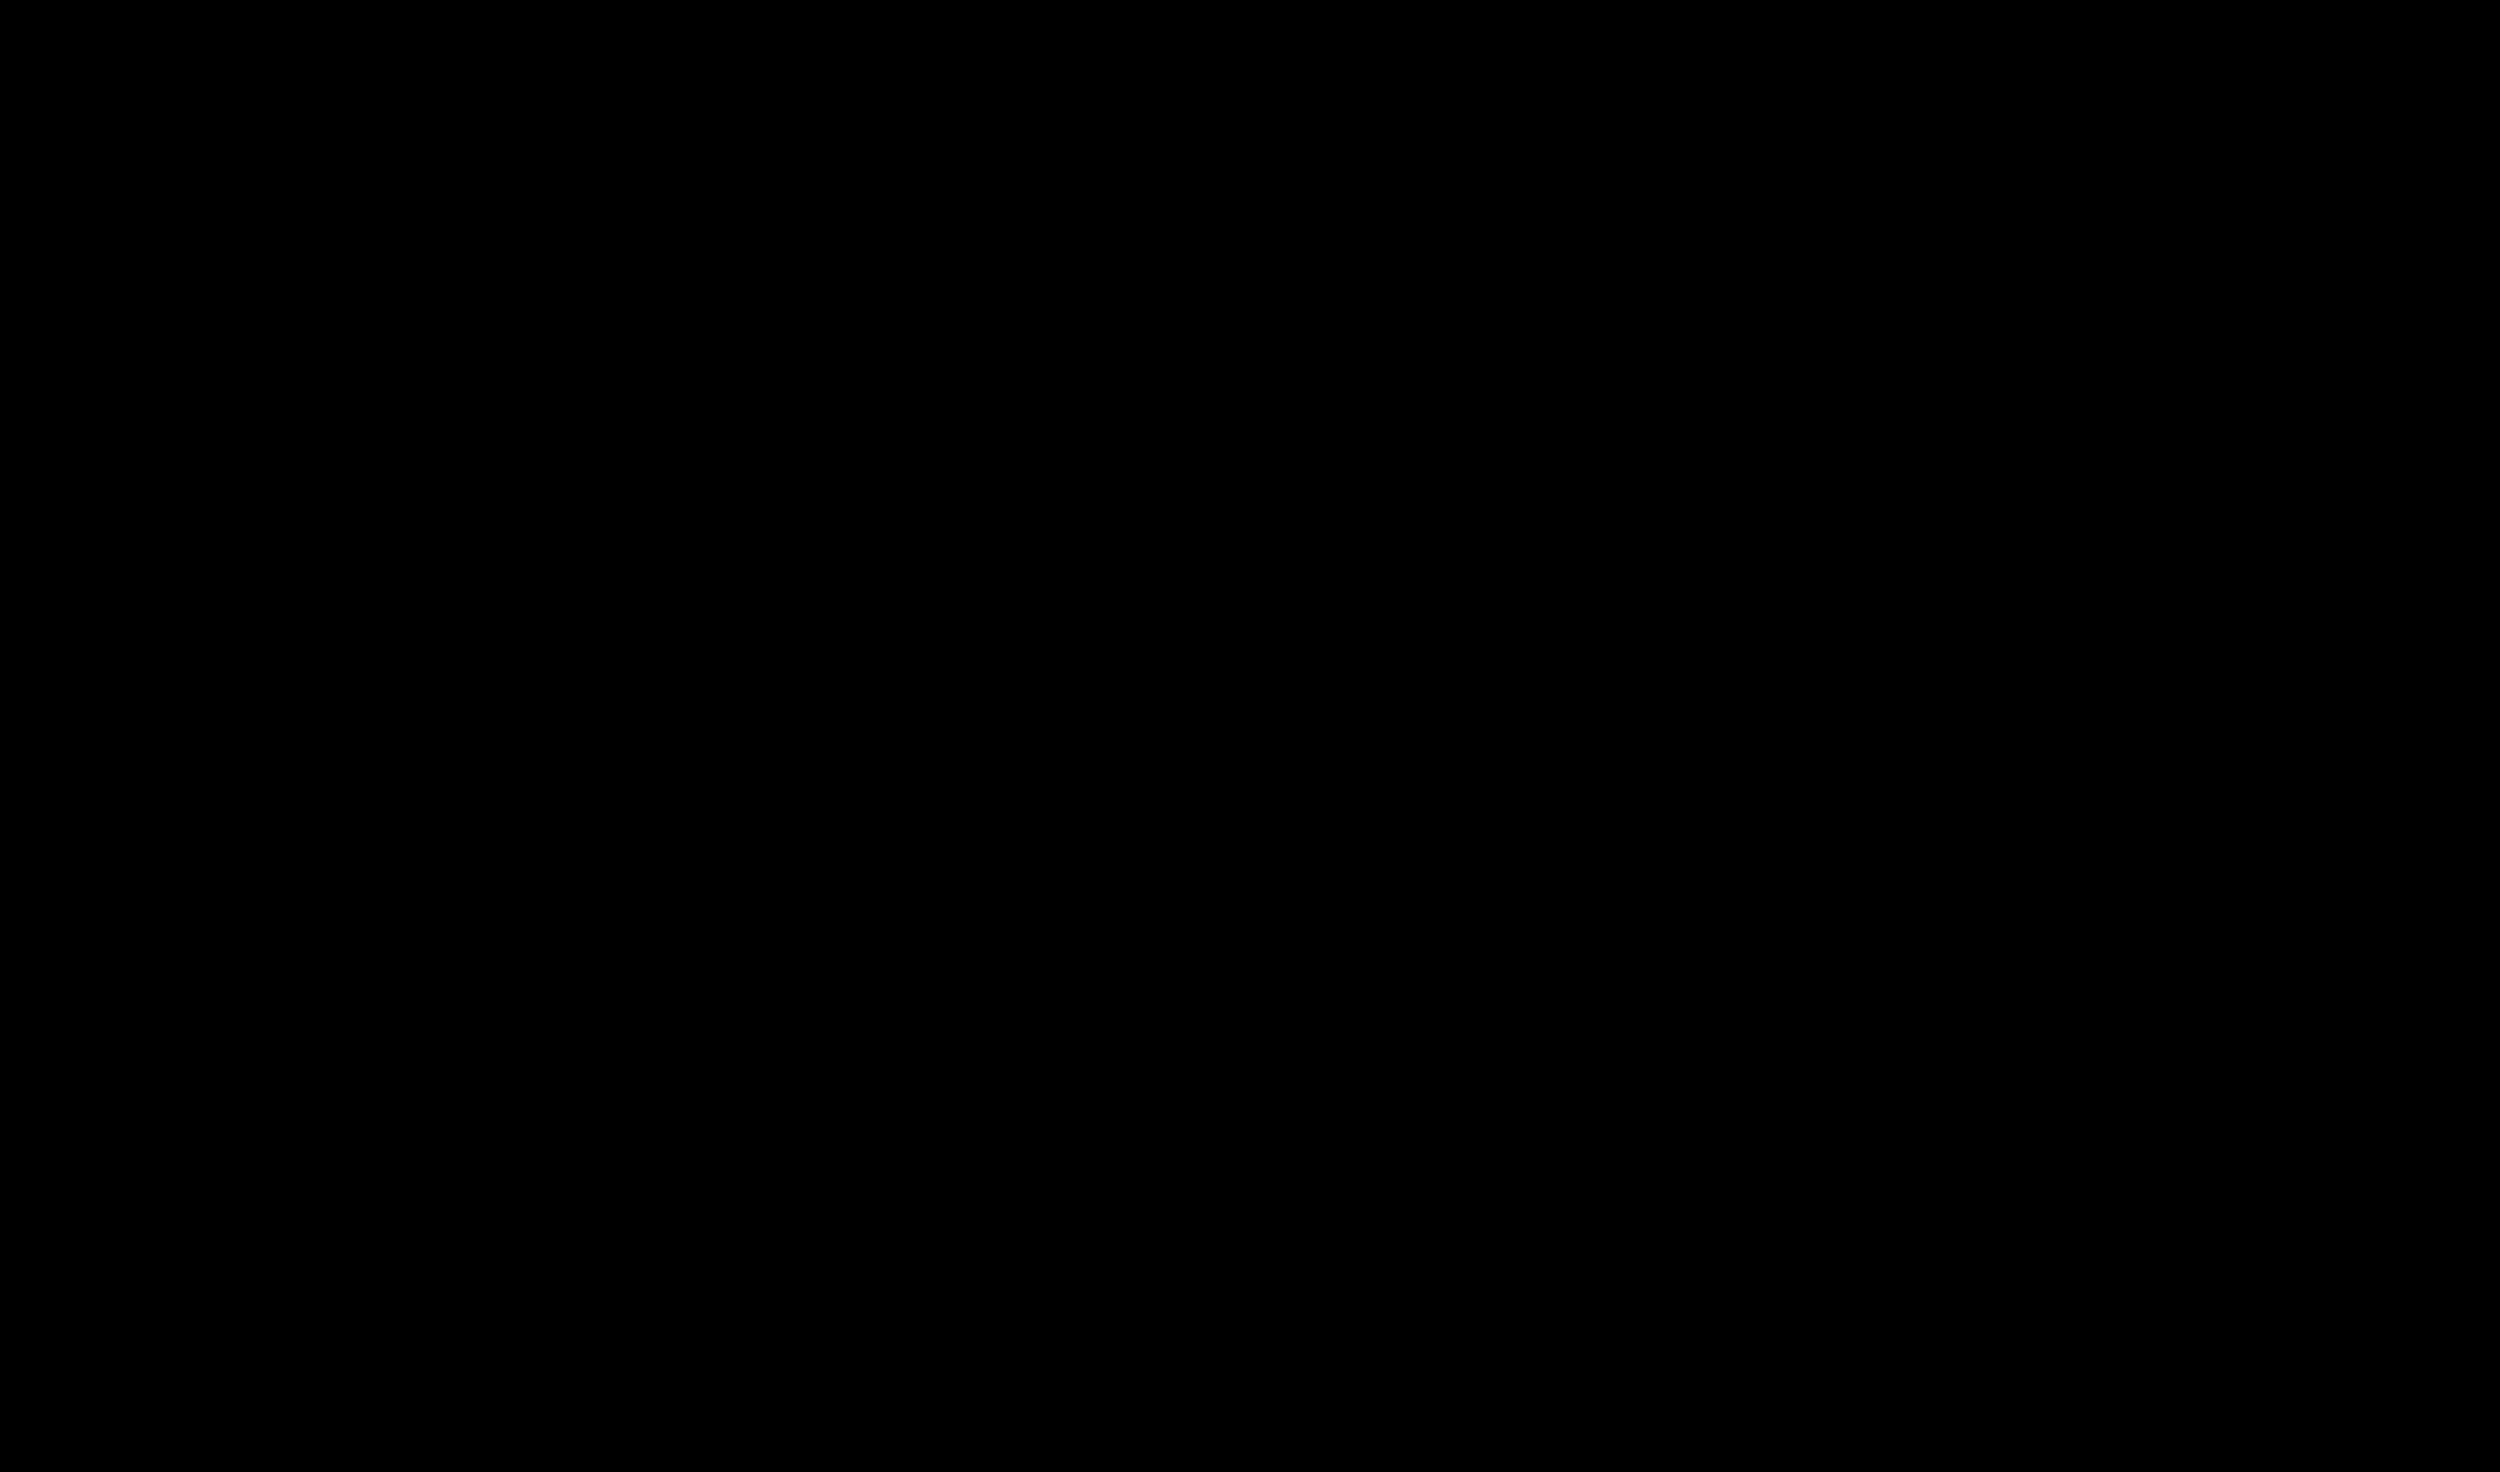 Ori_Media_logo_black_knockout.png